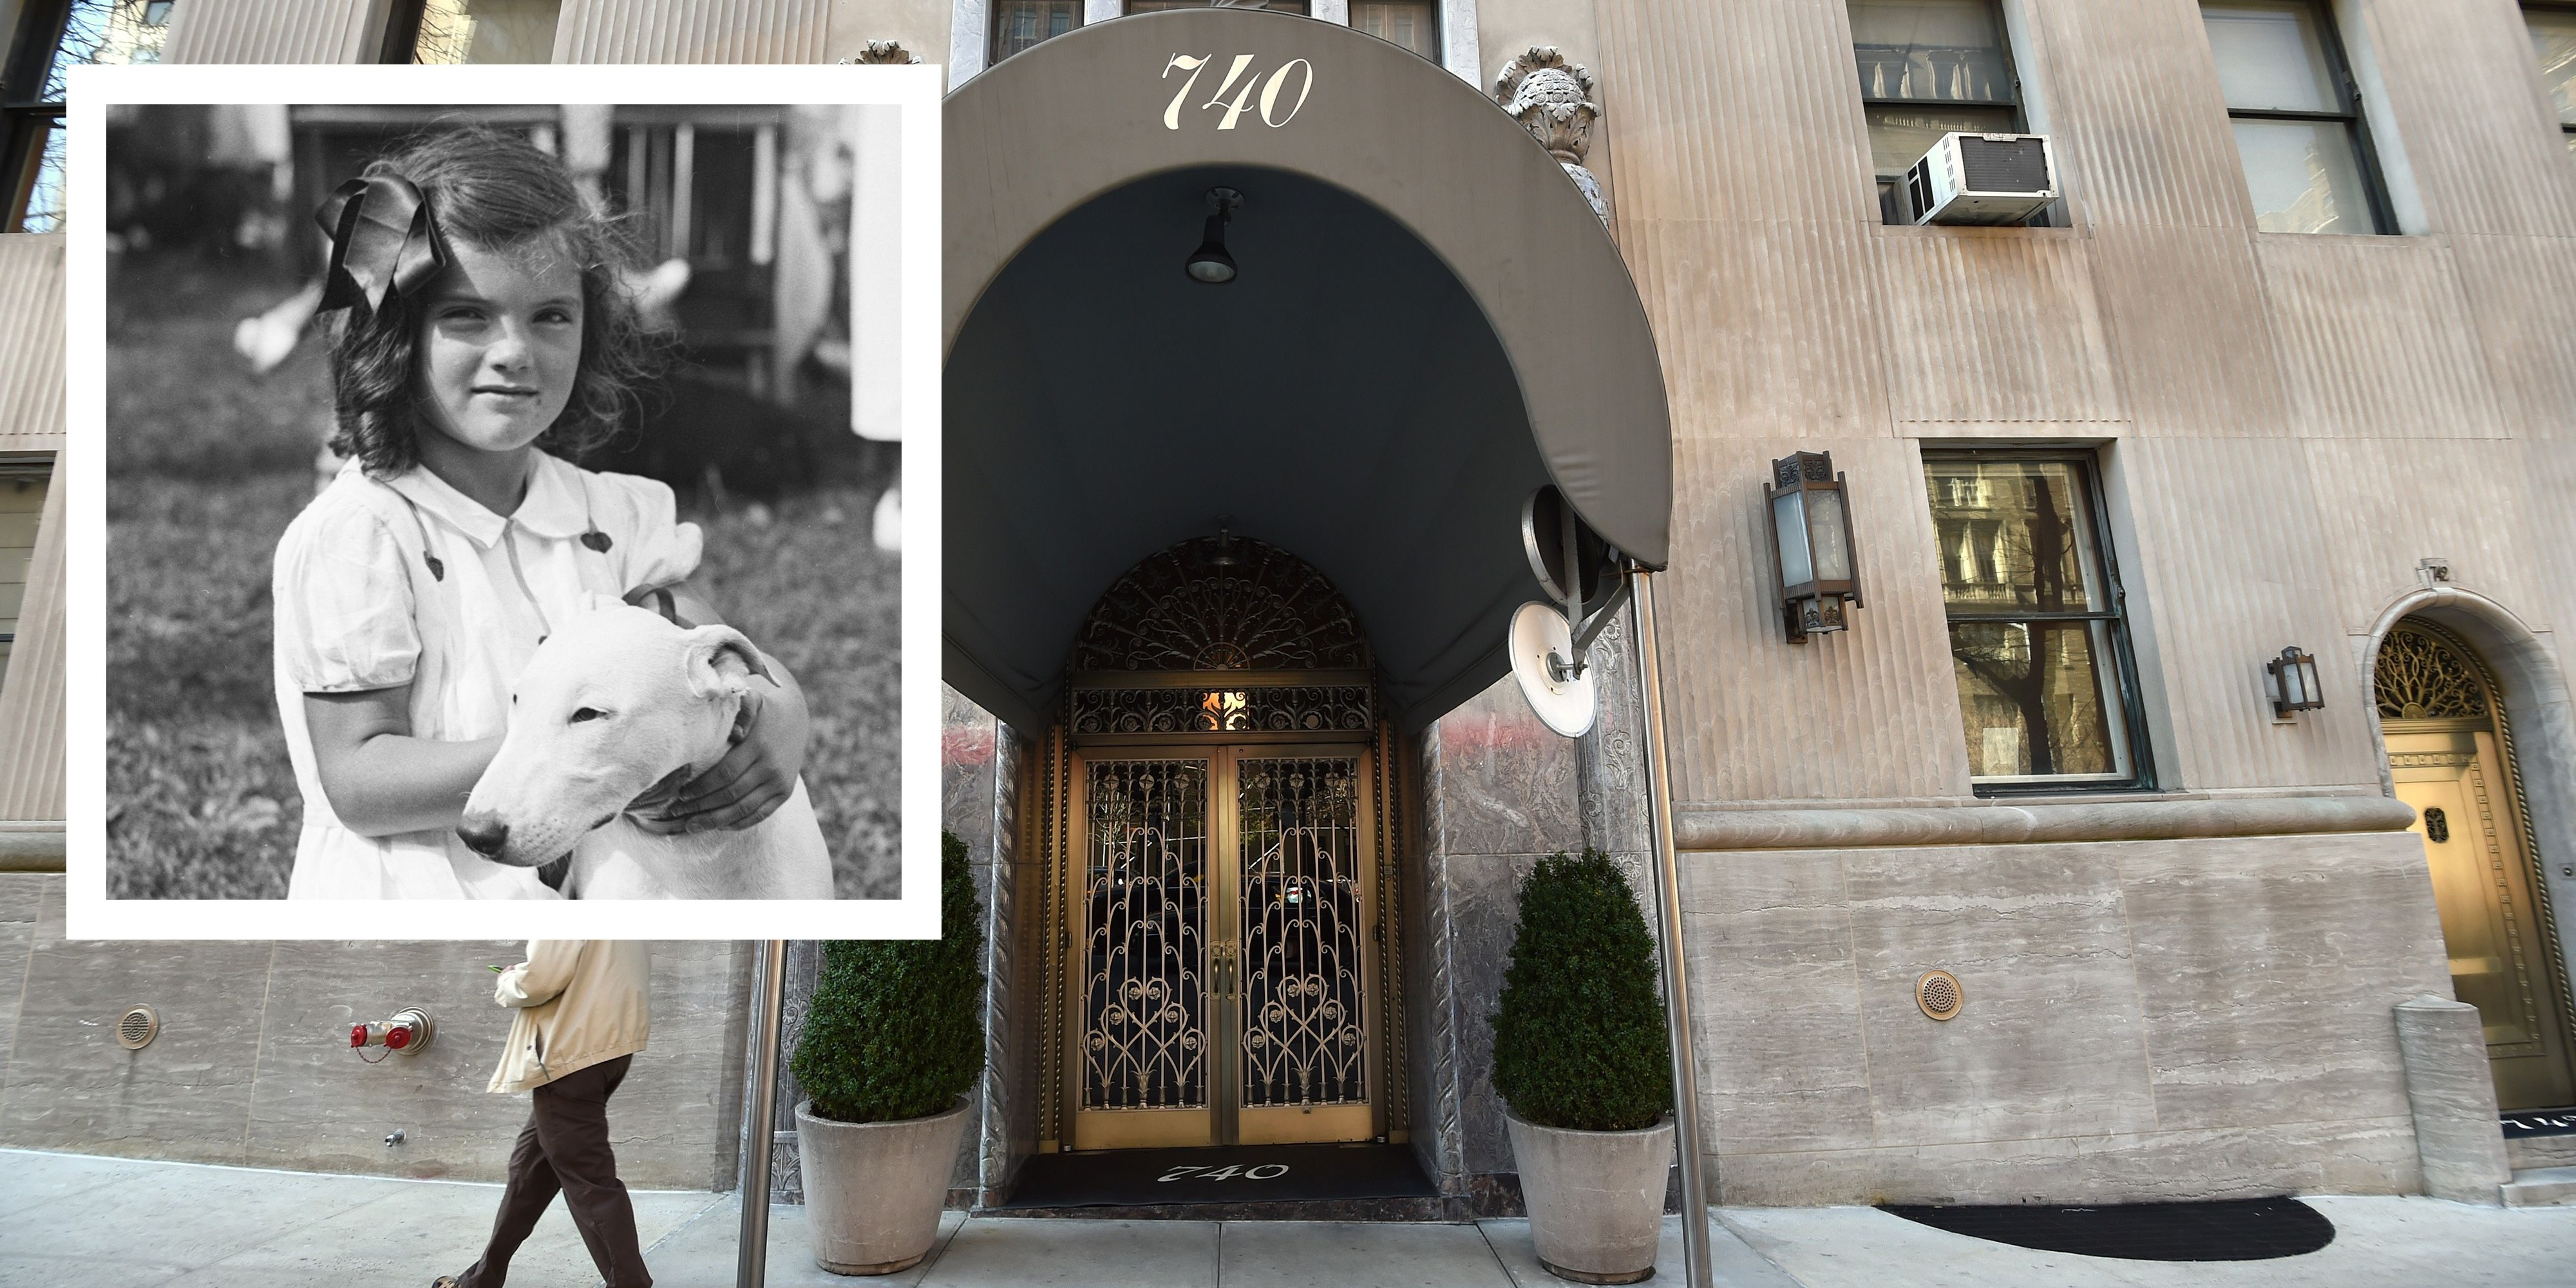 Jackie Kennedy 740 Park Avenue